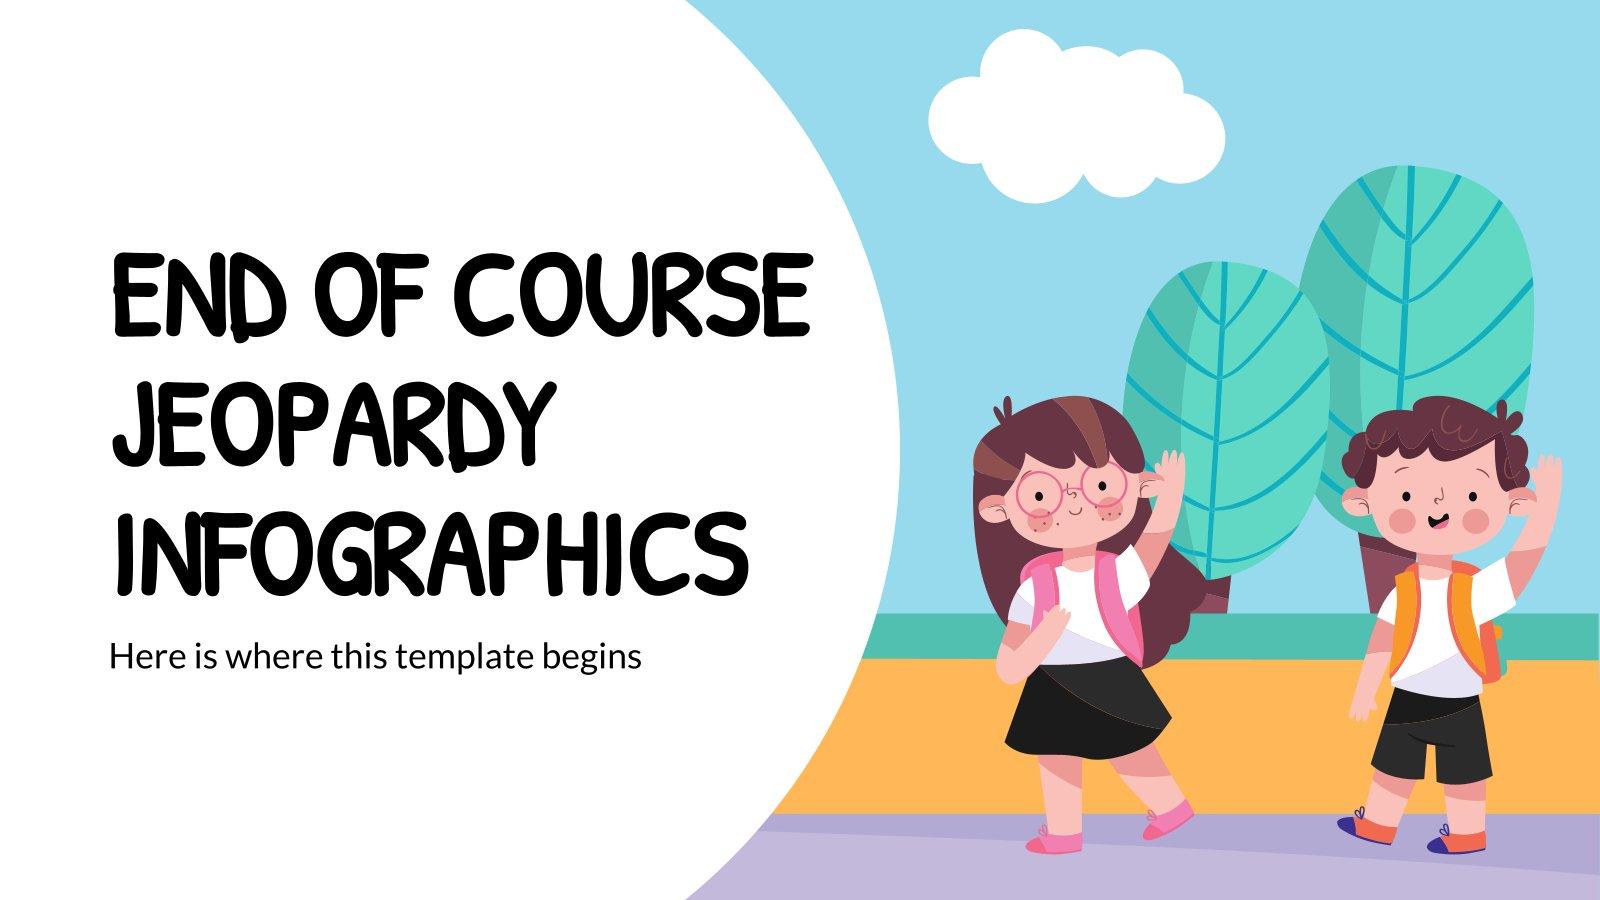 Ende des Kurses Jeopardy Infografiken Präsentationsvorlage